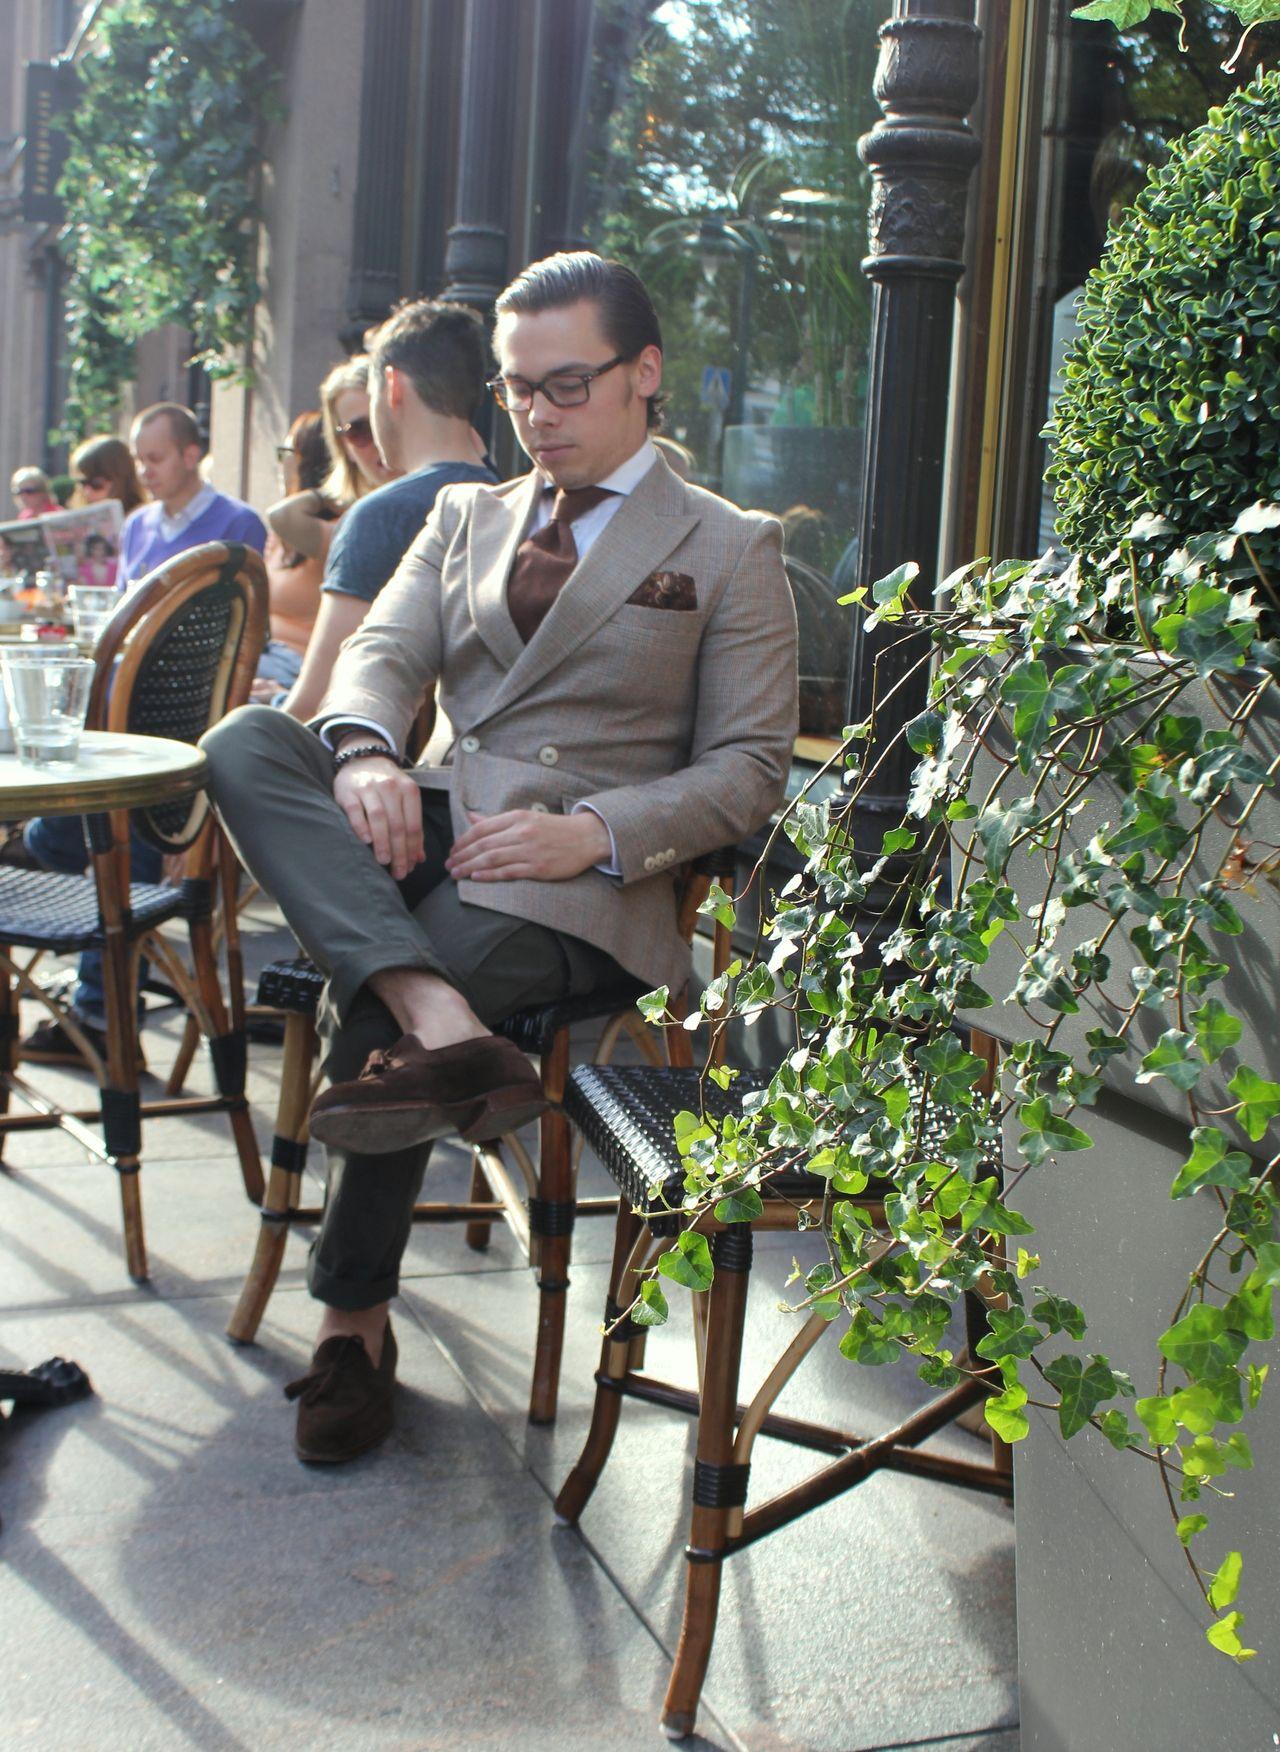 #MensFashion #Gentleman #Men #Fashion #Suit #Jacket #SingleBreasted #Shirt #Tie #Pocketsquare #Lapels #Vents #SleeveButtons #Trousers #Cuffs #Fabrics #GoodLooking #Elegance